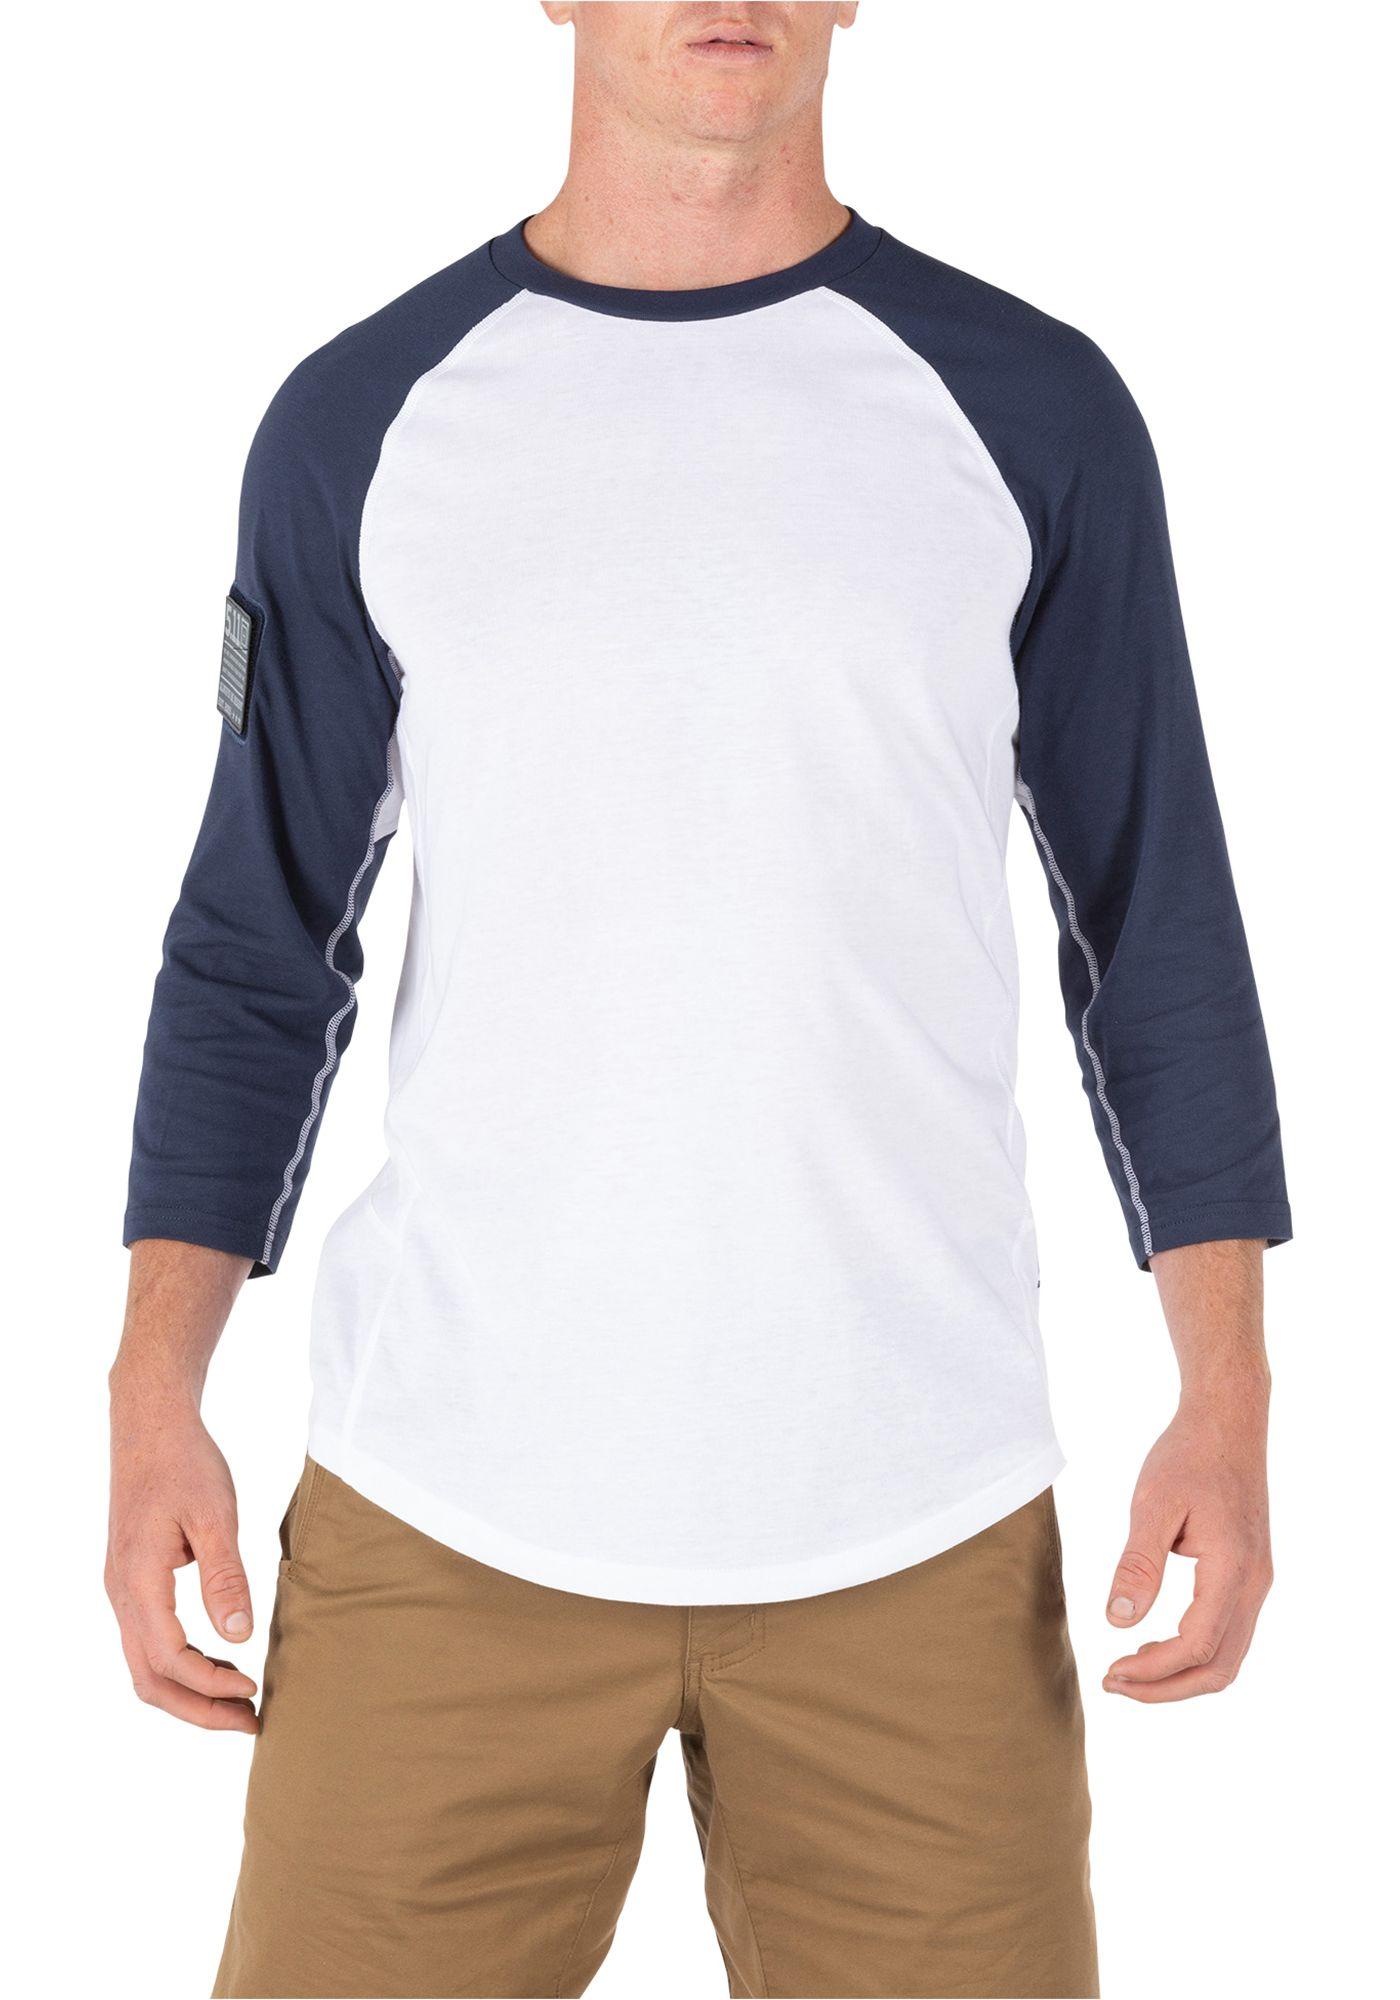 5.11 Tactical Men's Recon Sprint Baseball T-Shirt